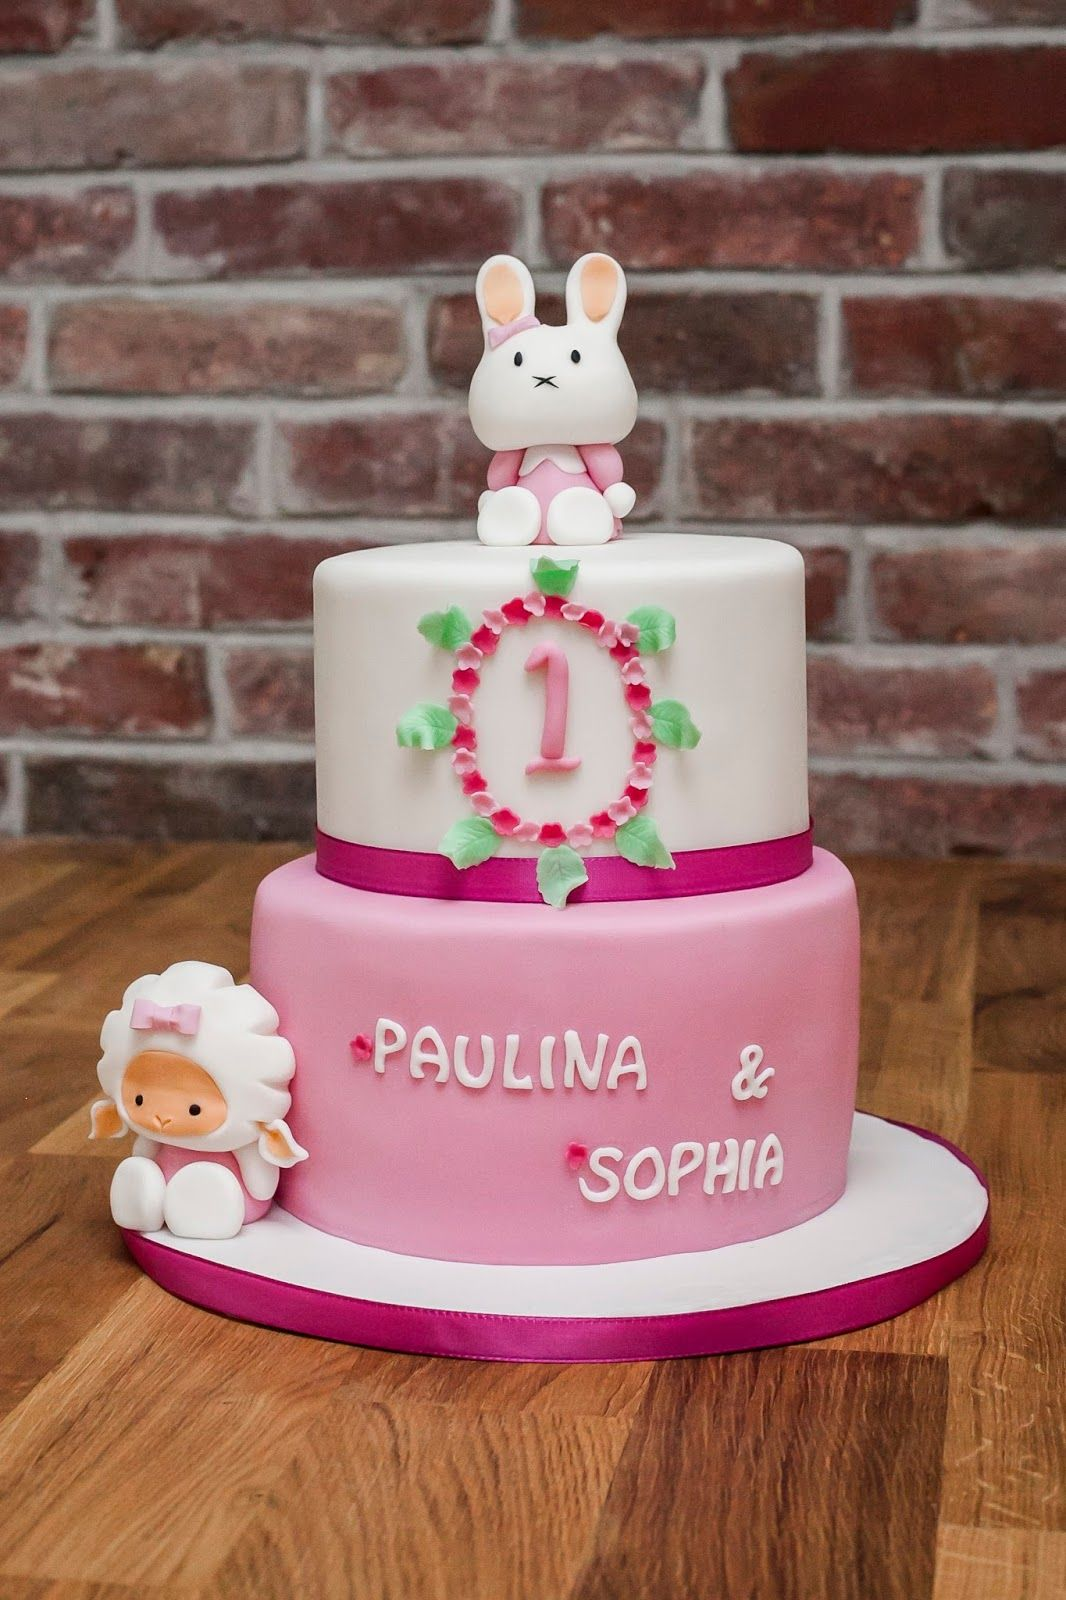 Feines Handwerk Torte Zum 1 Geburtstag Zwillings Torte Miffy